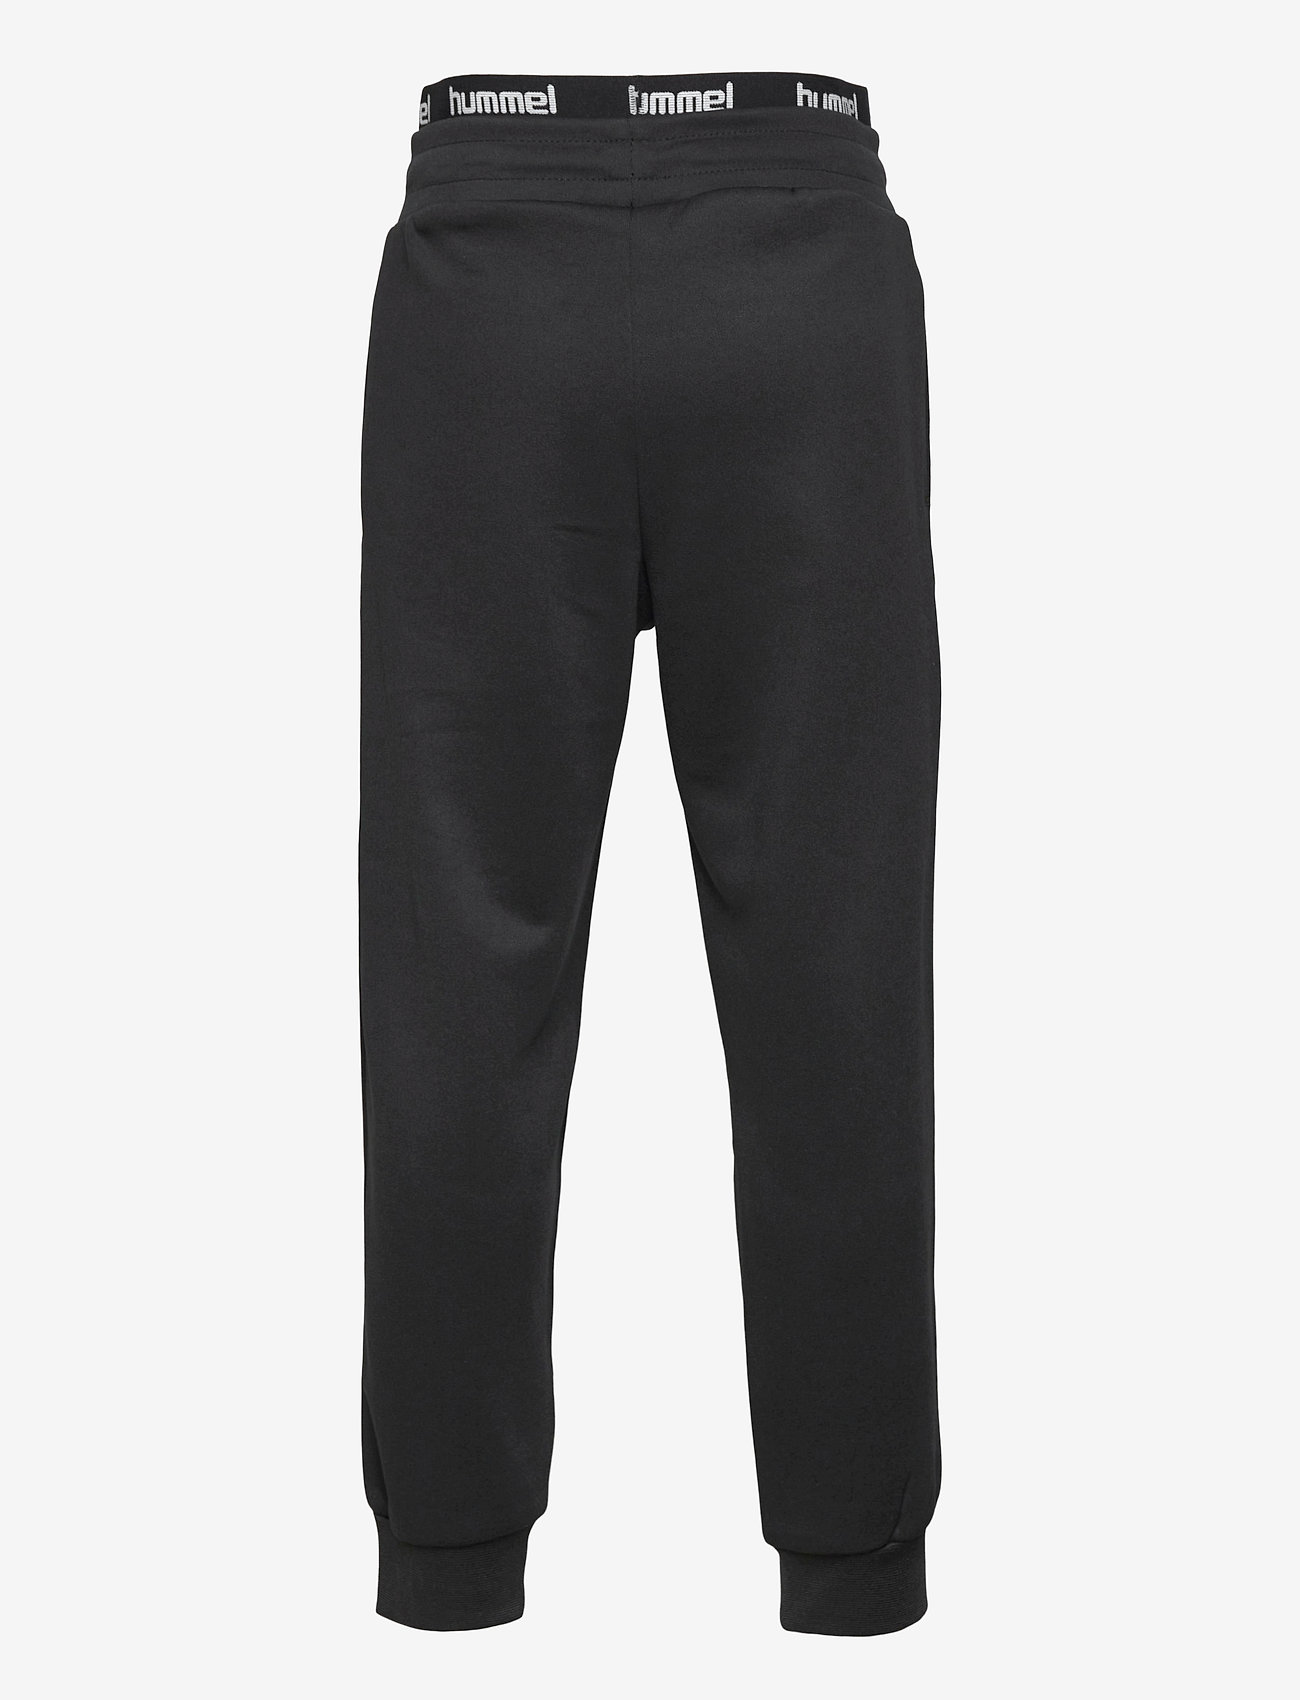 Hummel - hmlNILAR PANTS - sweatpants - black - 1